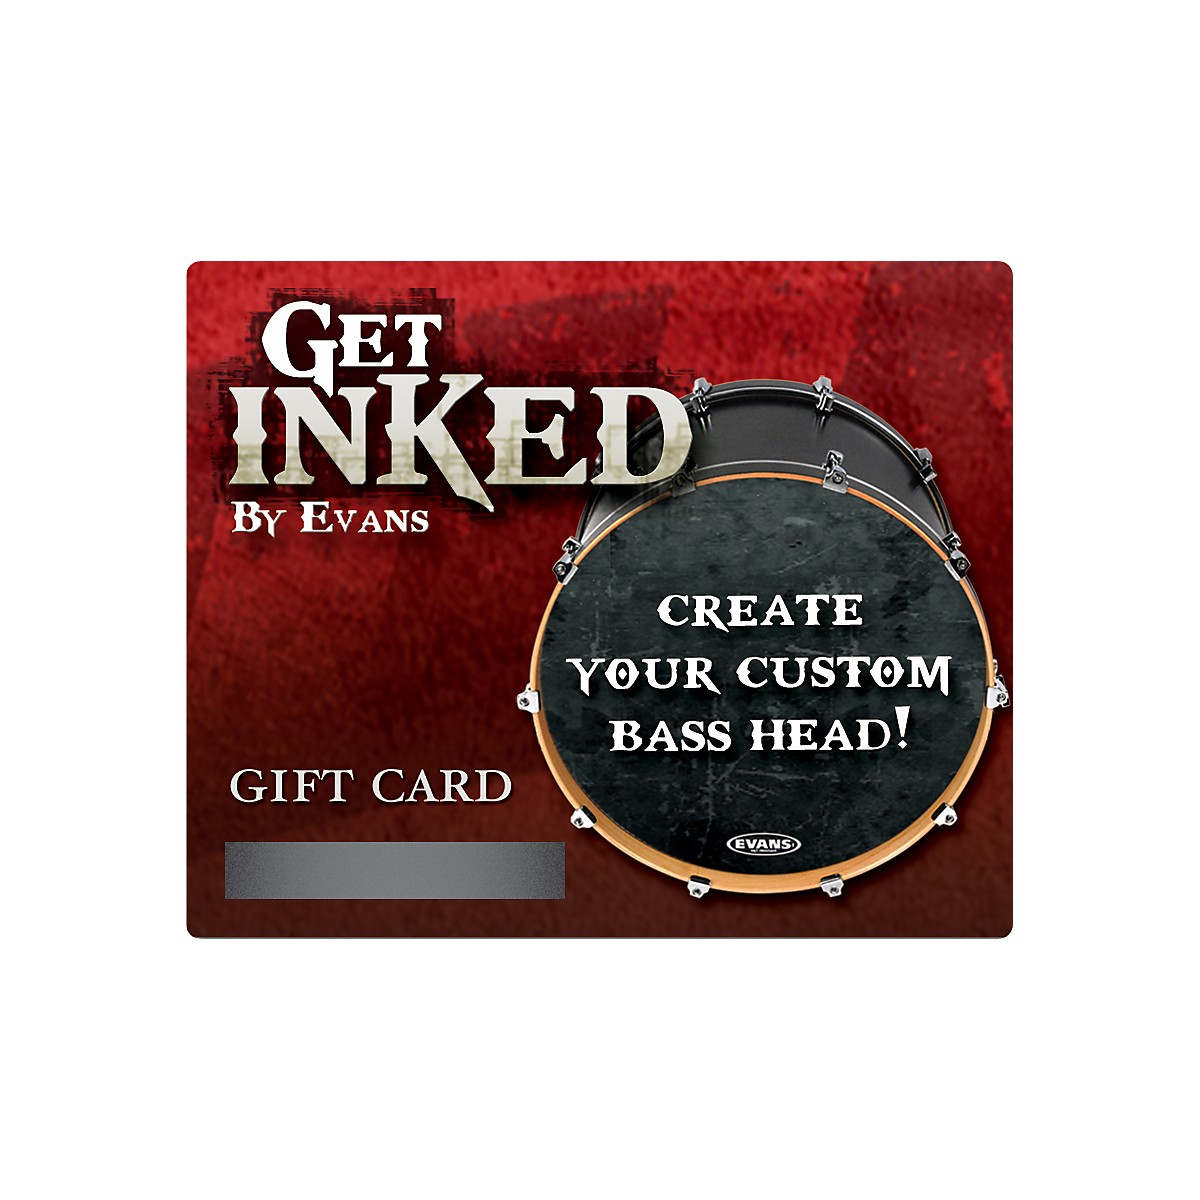 Evans Inked by Evans Custom Bass Head Gift Card